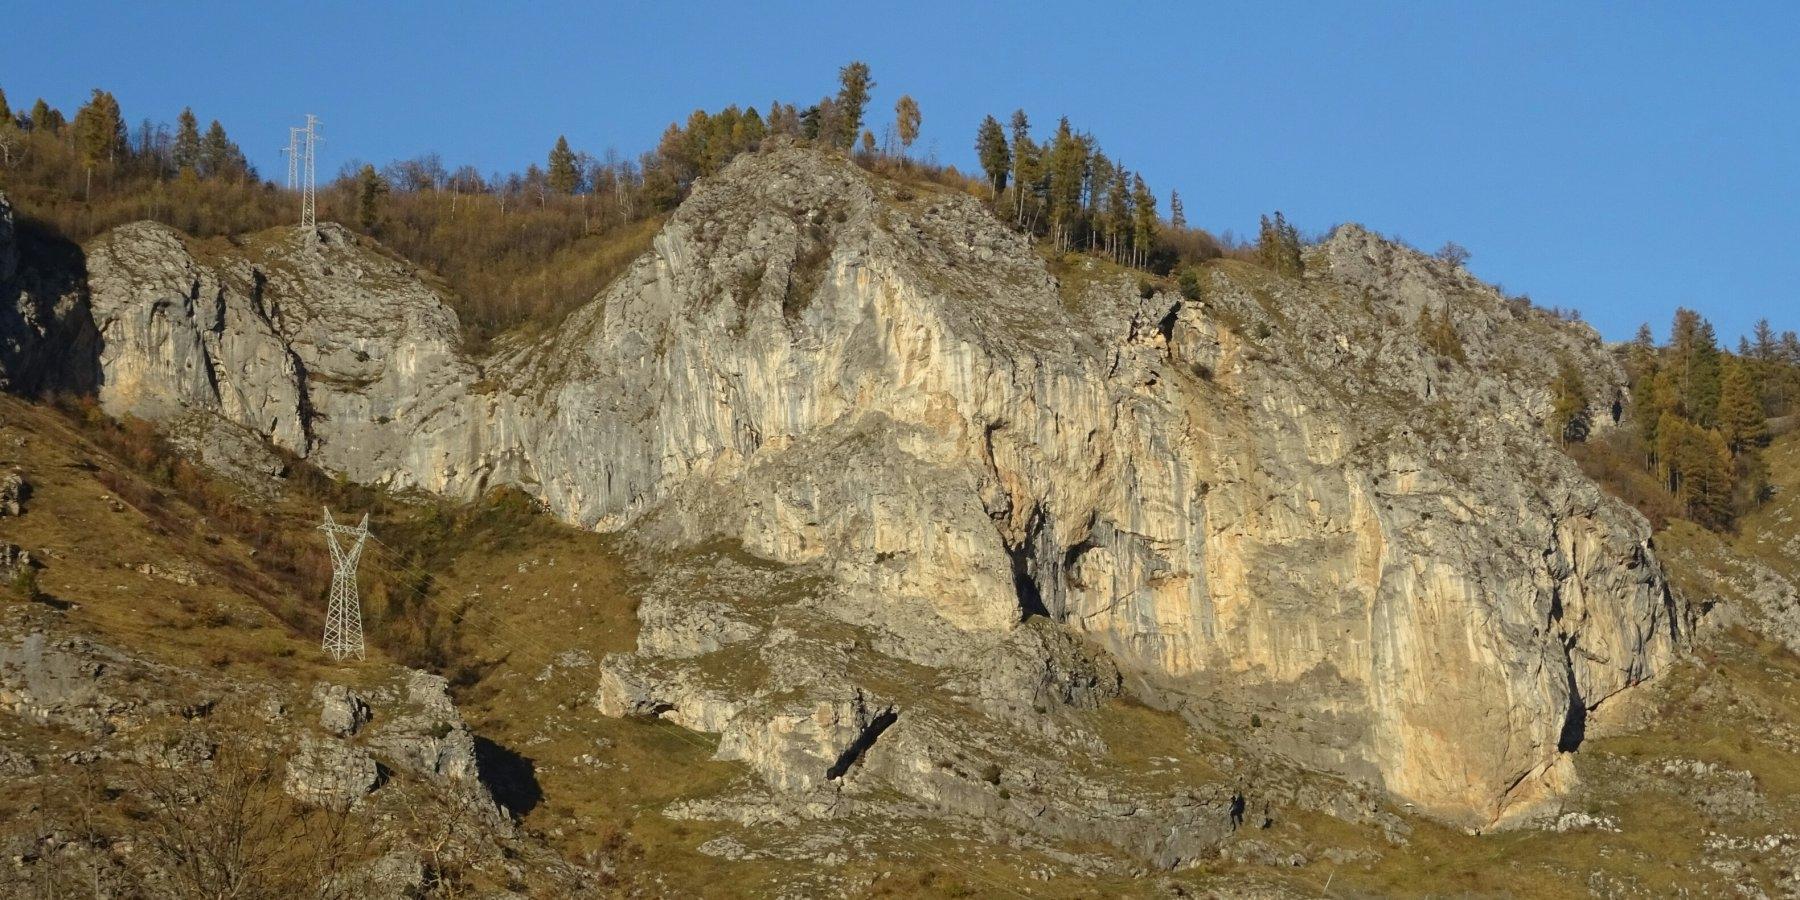 Arrampicare ad Andonno - Oliunìd is crag